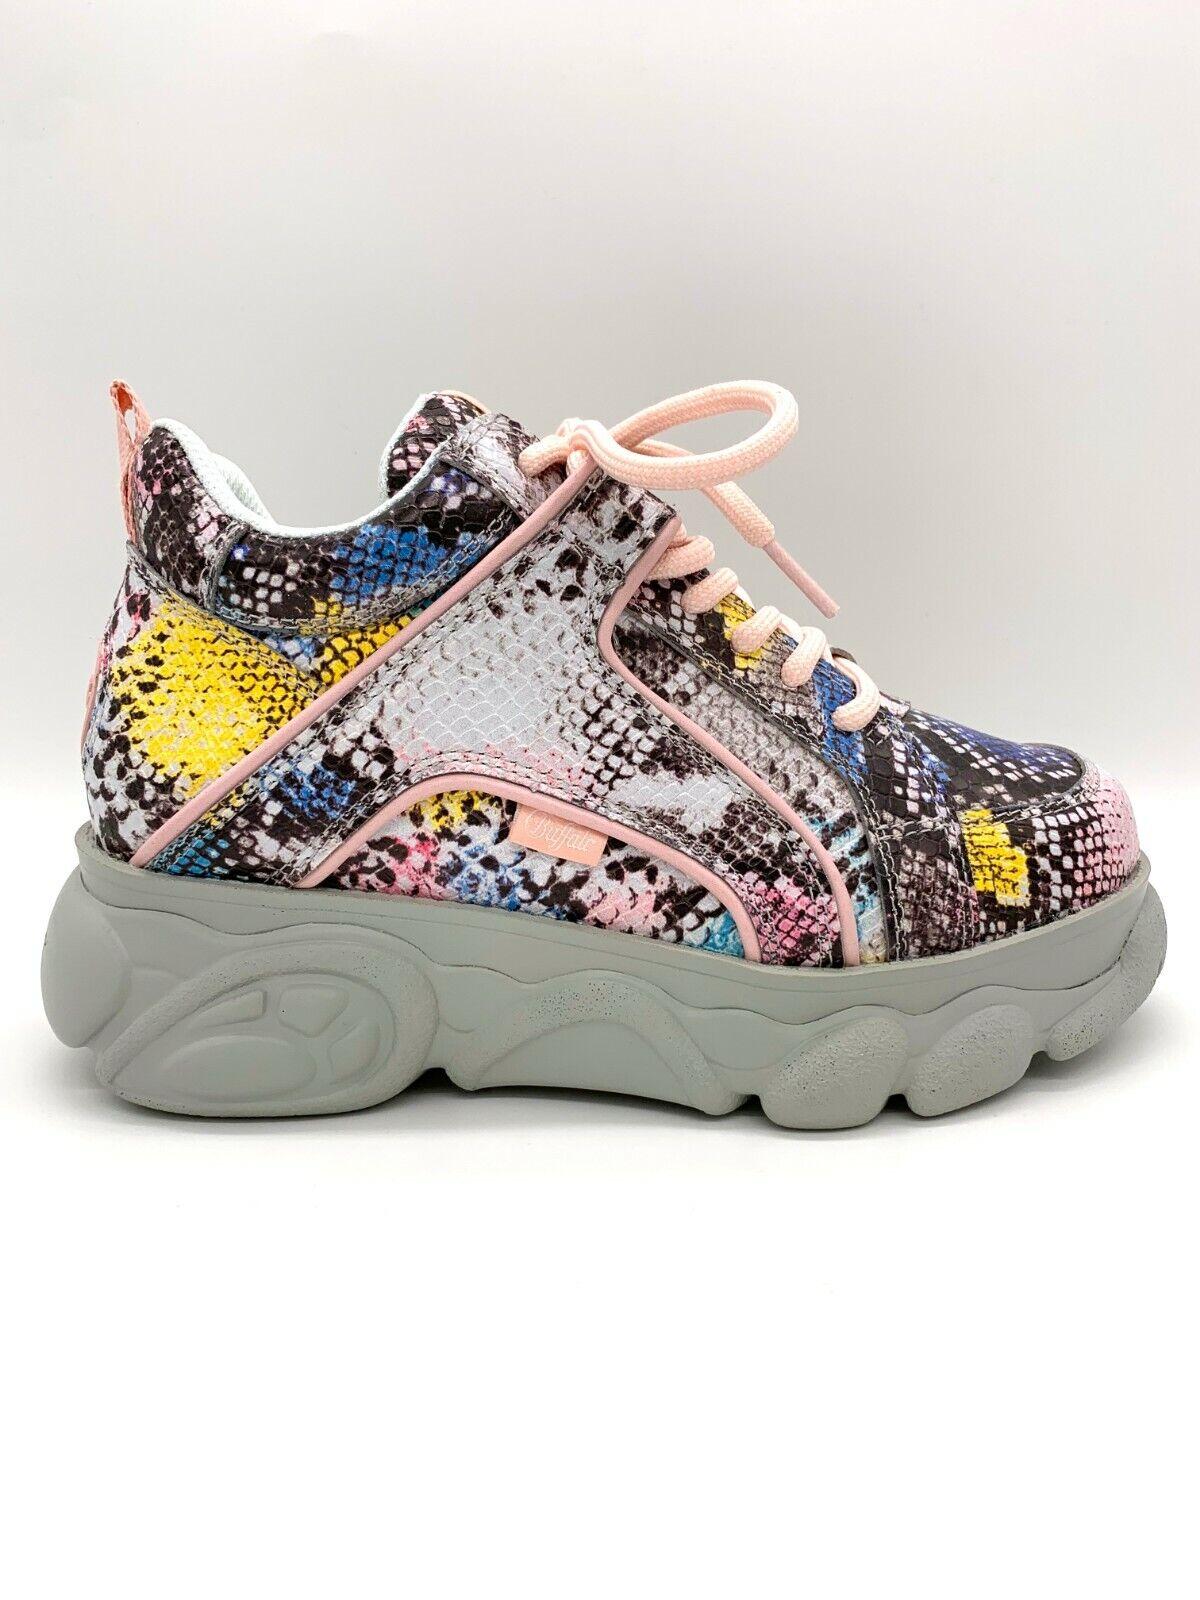 Details about Buffalo Boots Shoes Sneaker Platform Shoes 90er Limited Snake Multi Color show original title